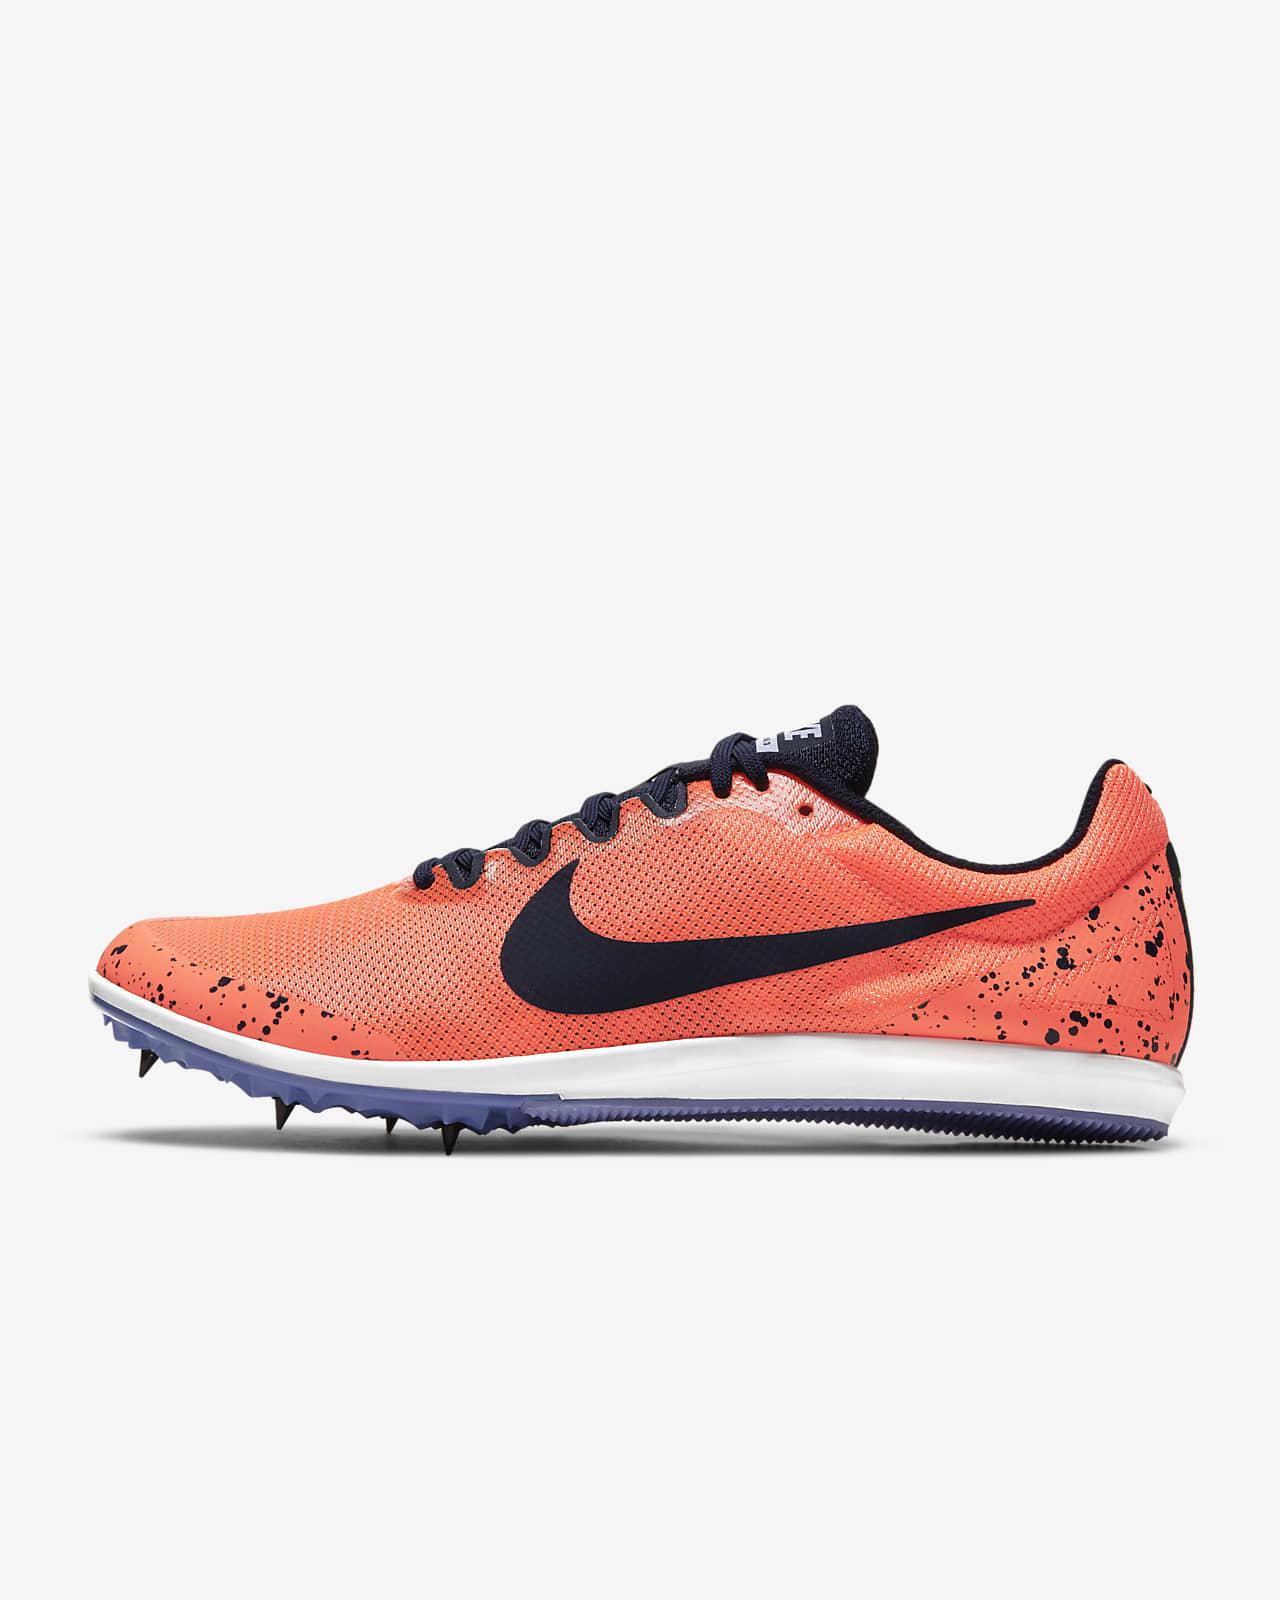 Nike Zoom Rival D 10 Leichtathletikschuh (Unisex)